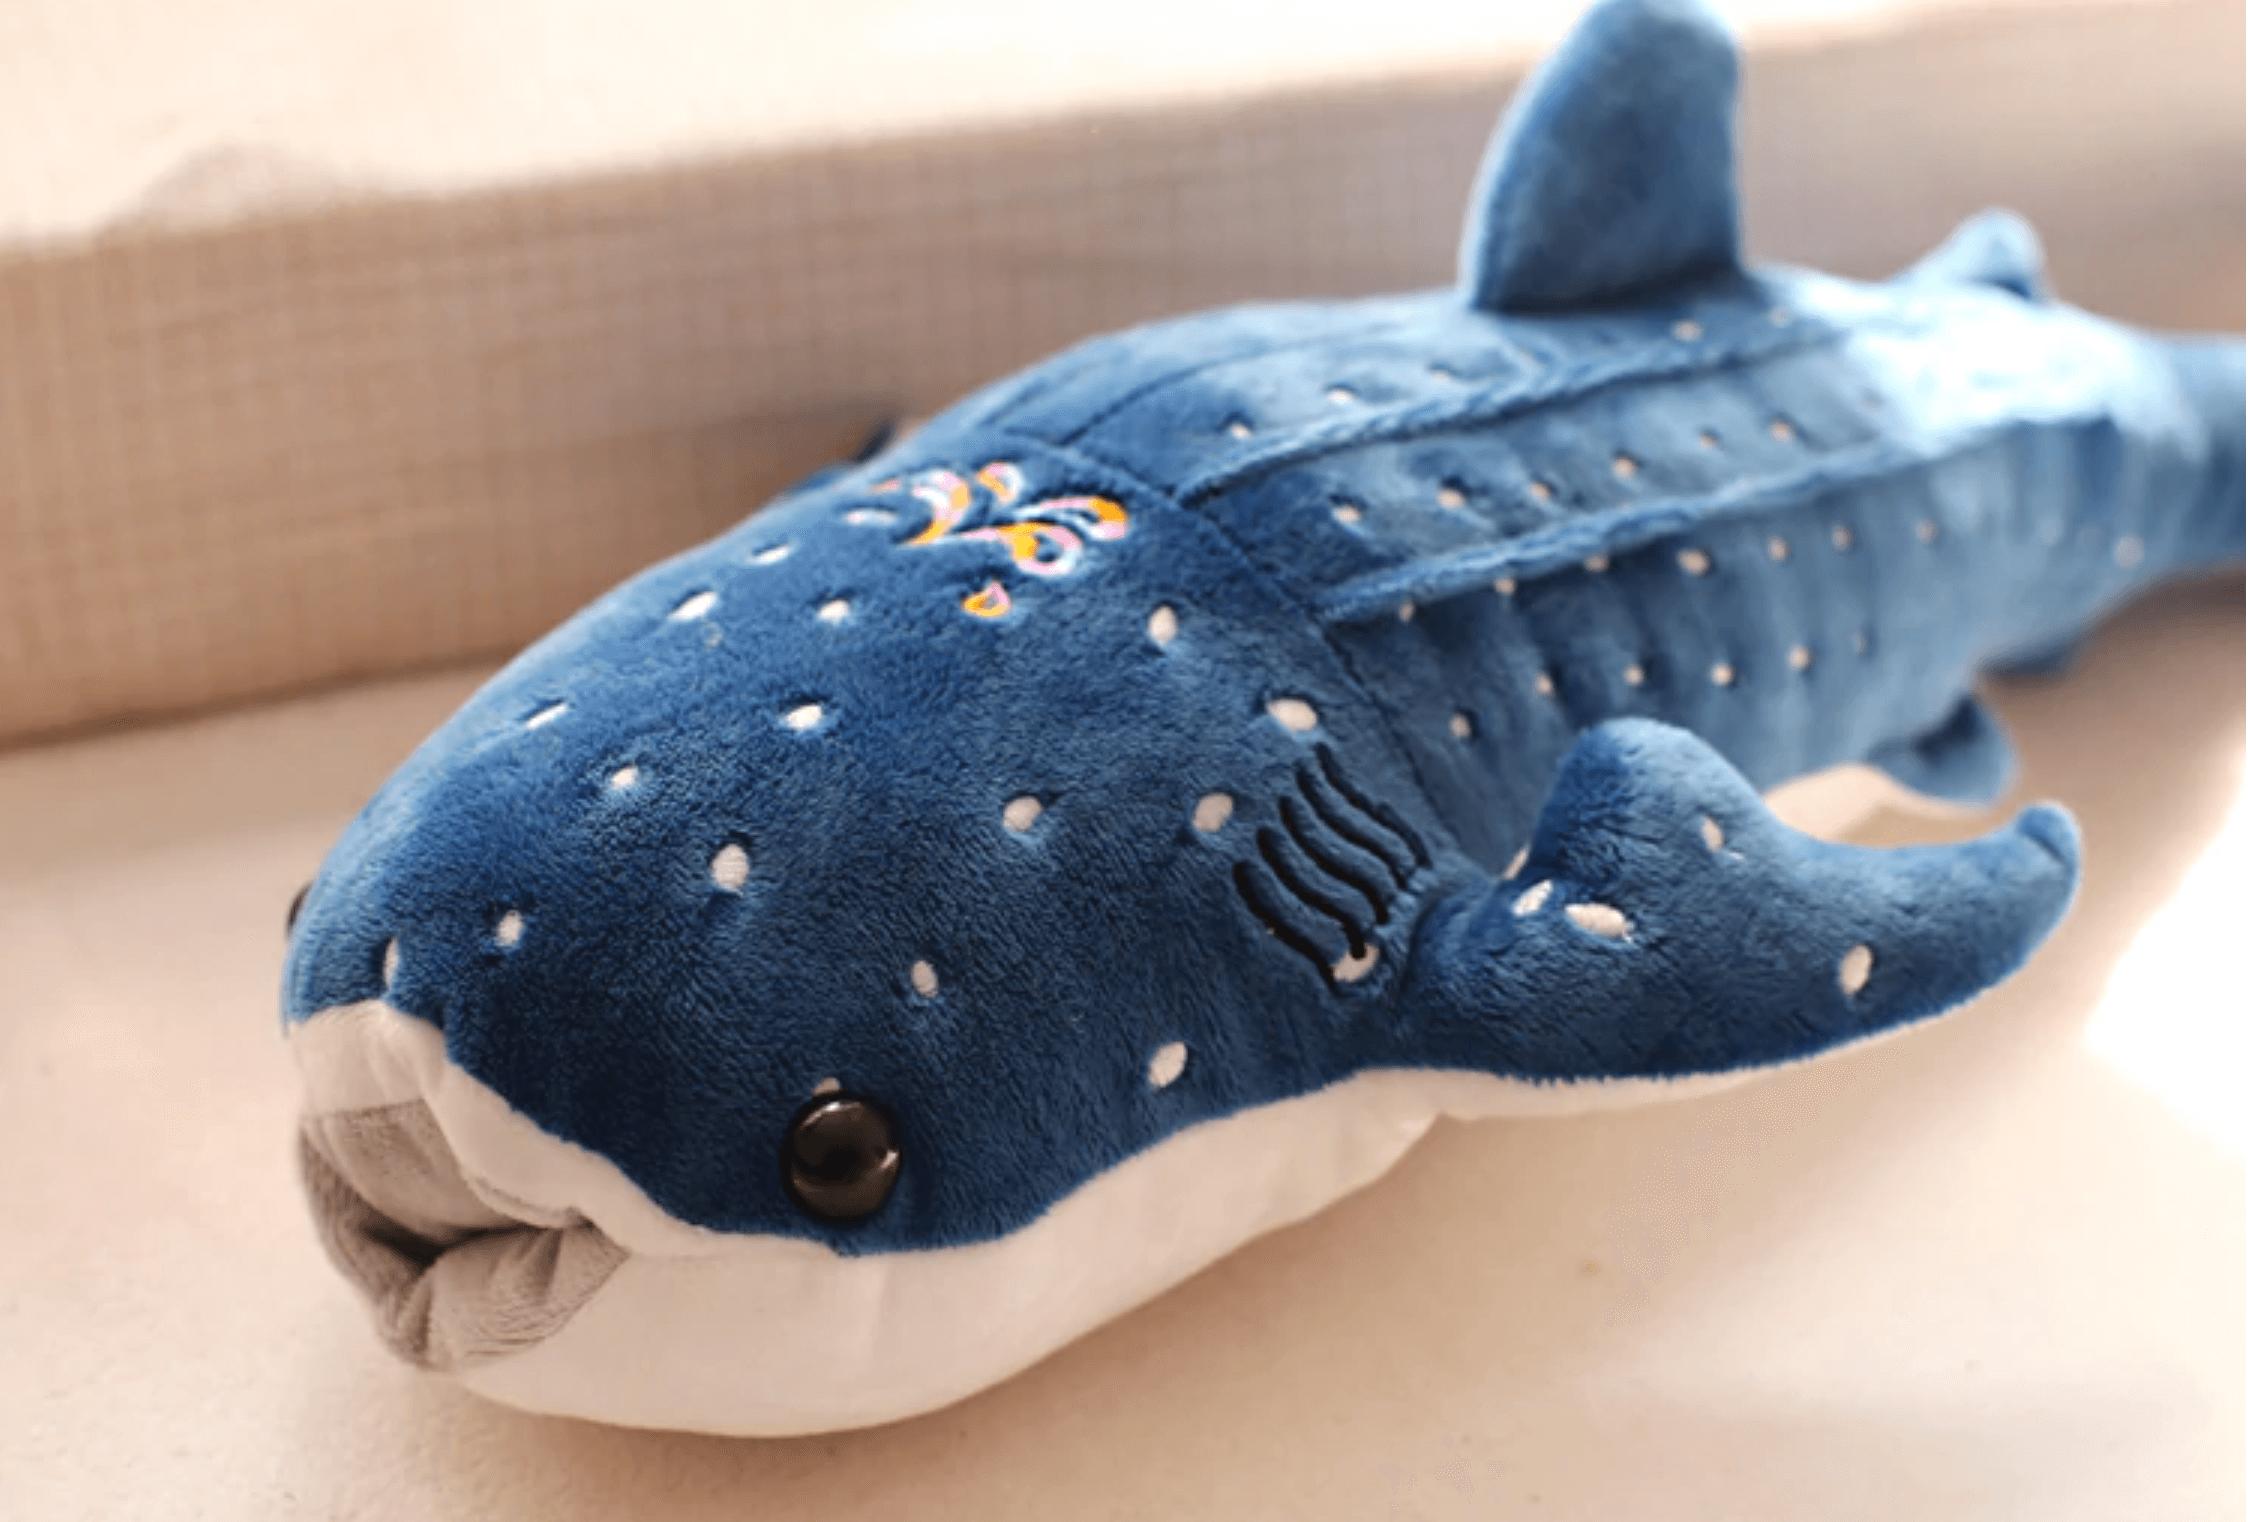 Giant Blue Whale Plush Toy